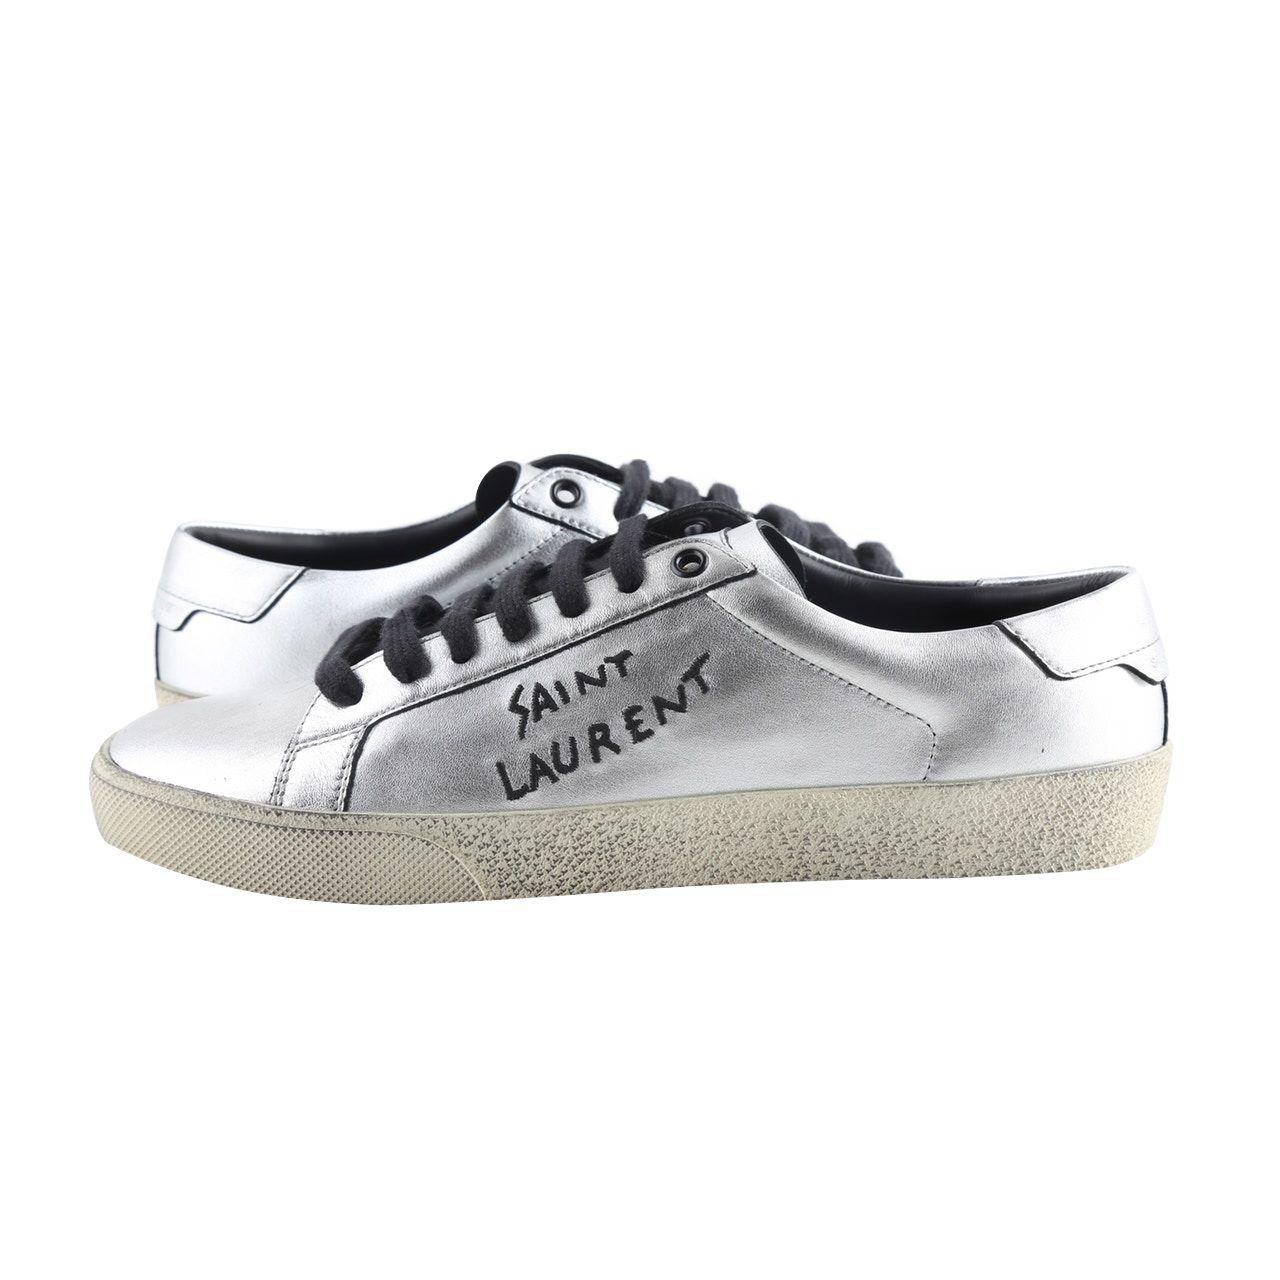 Saint Laurent Silver Metallic Leather